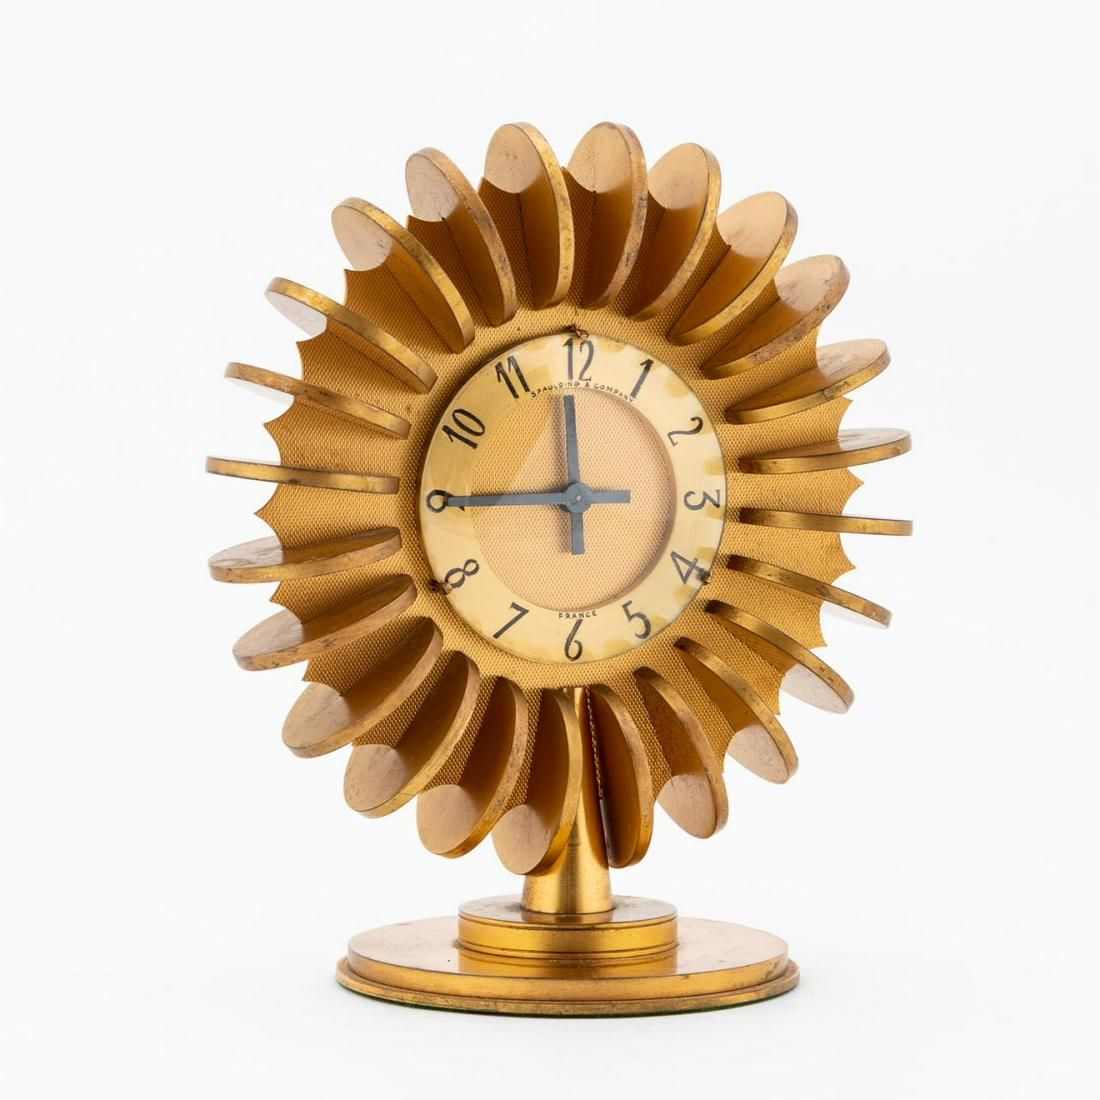 SPAULDING & CO FRENCH ART DECO STYLE MANTEL CLOCK